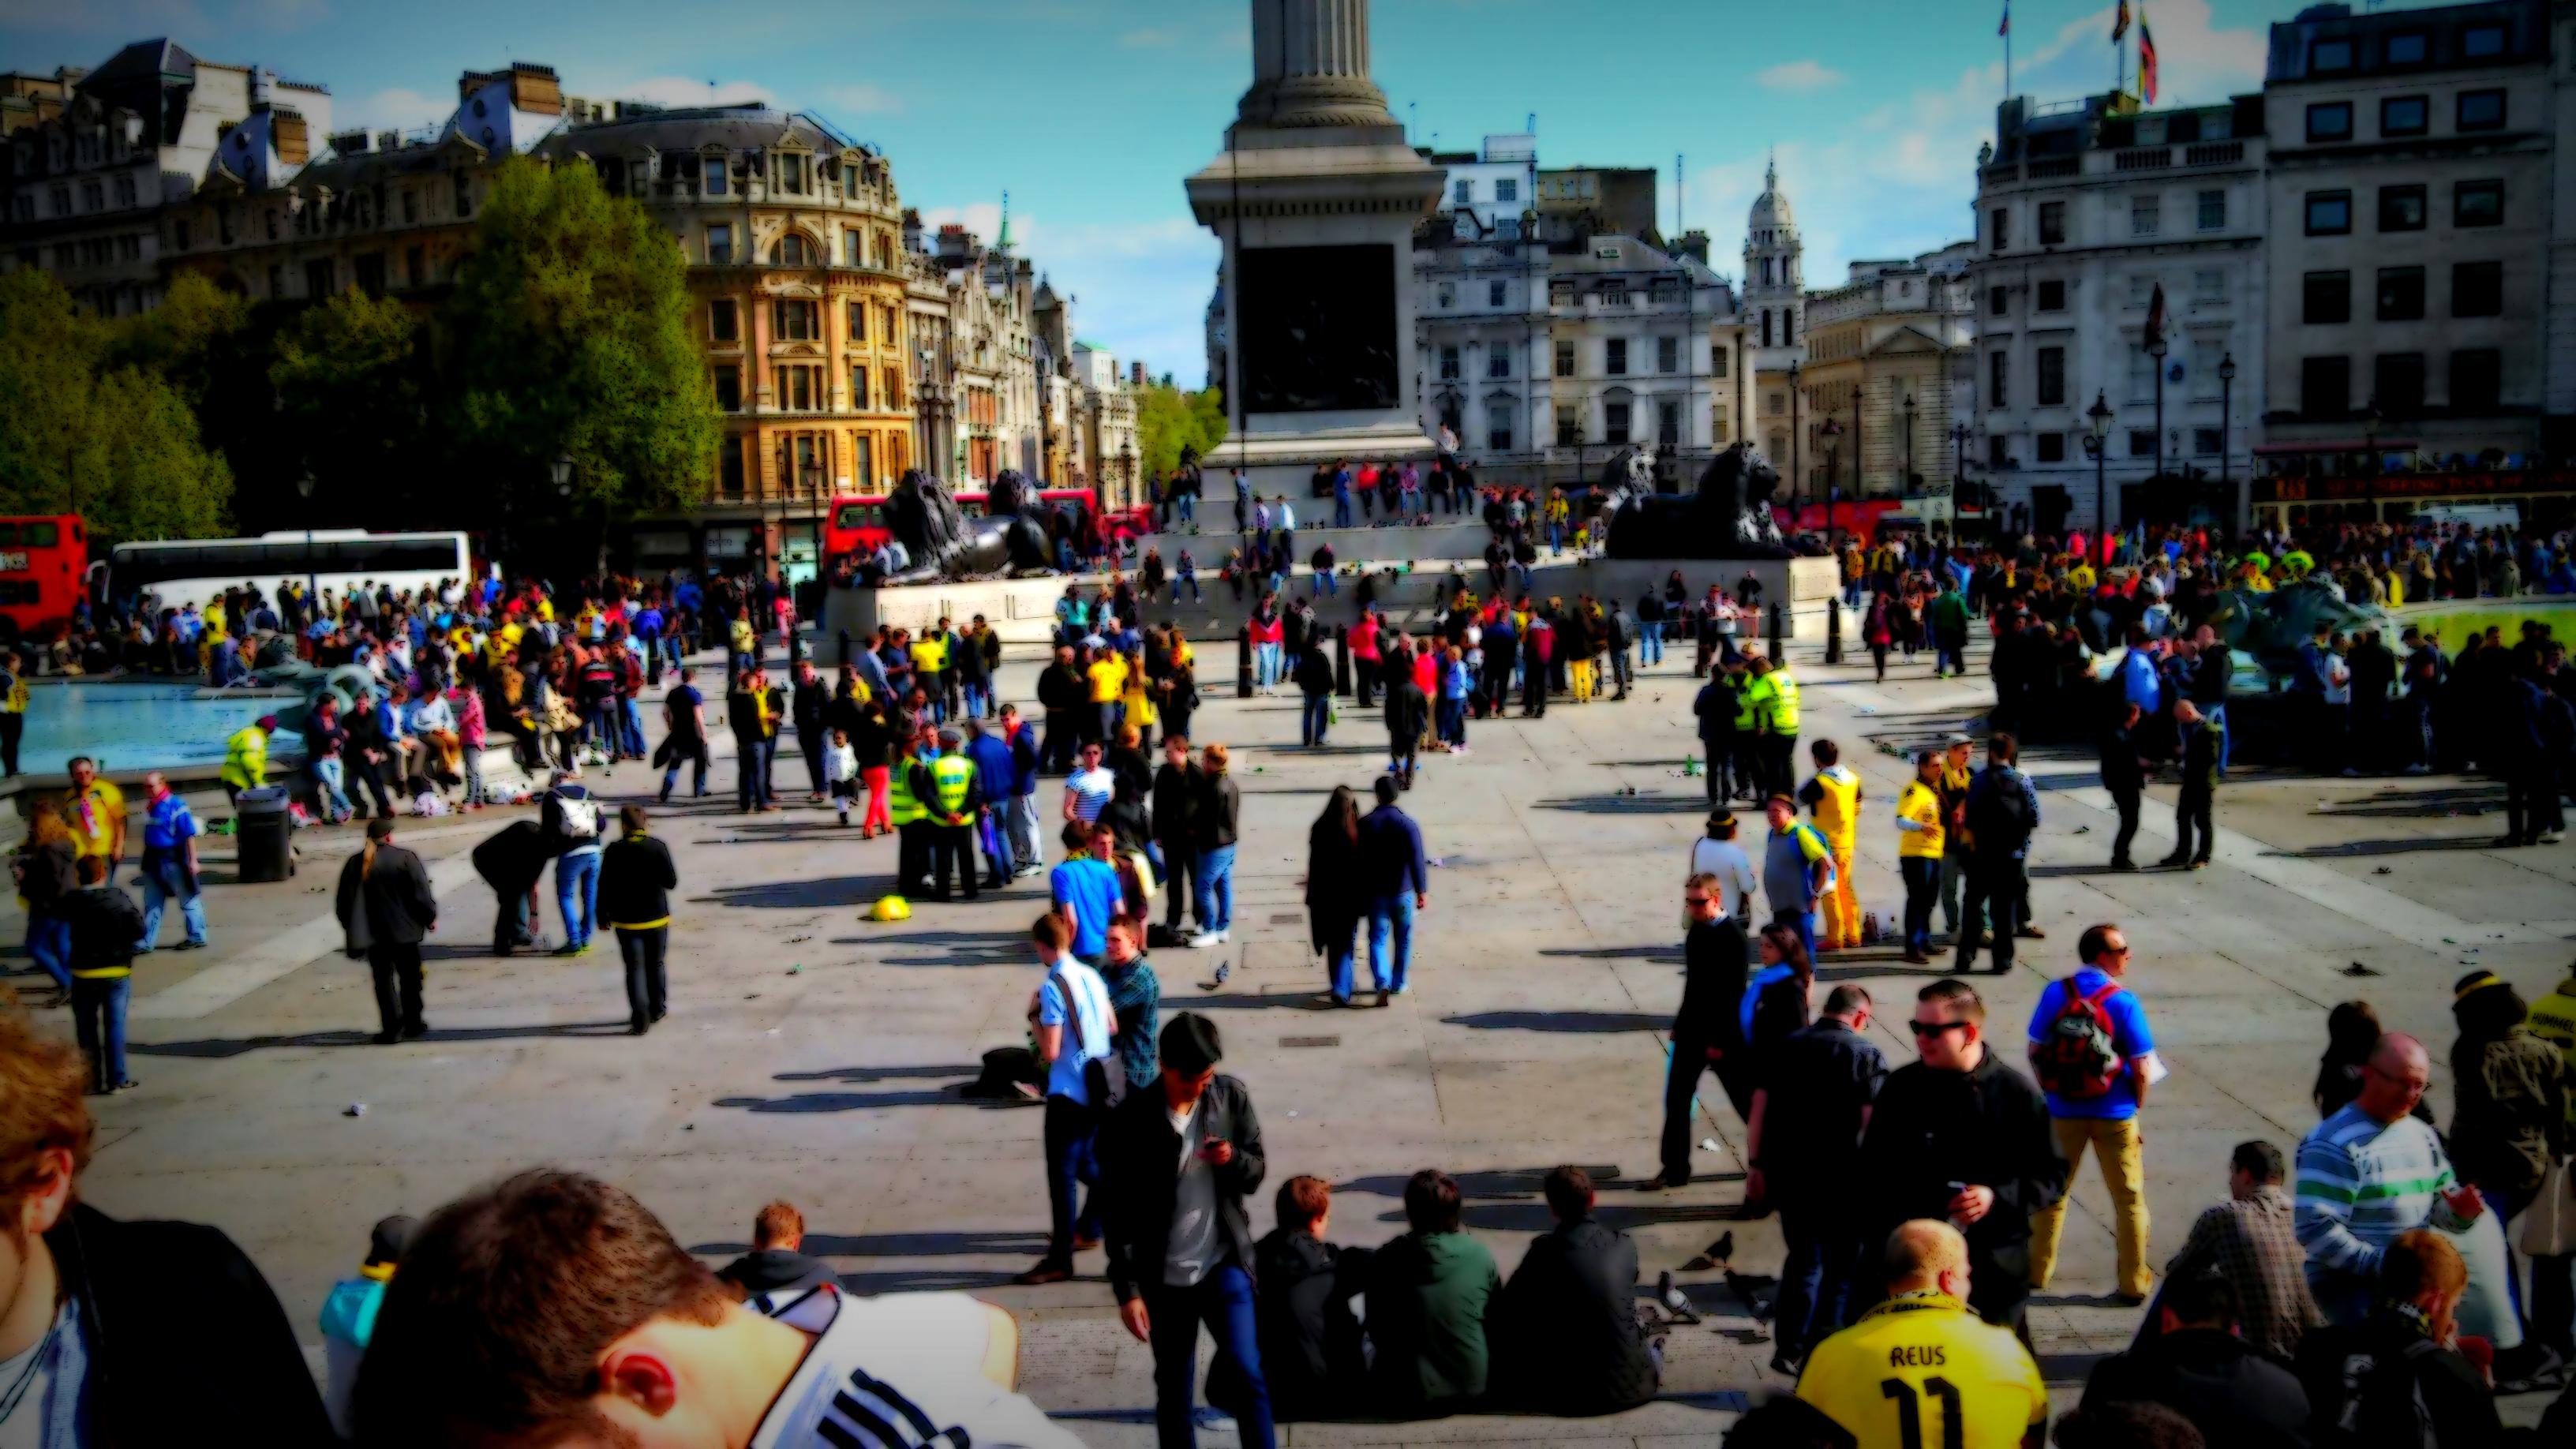 london street scenes trafalgar square